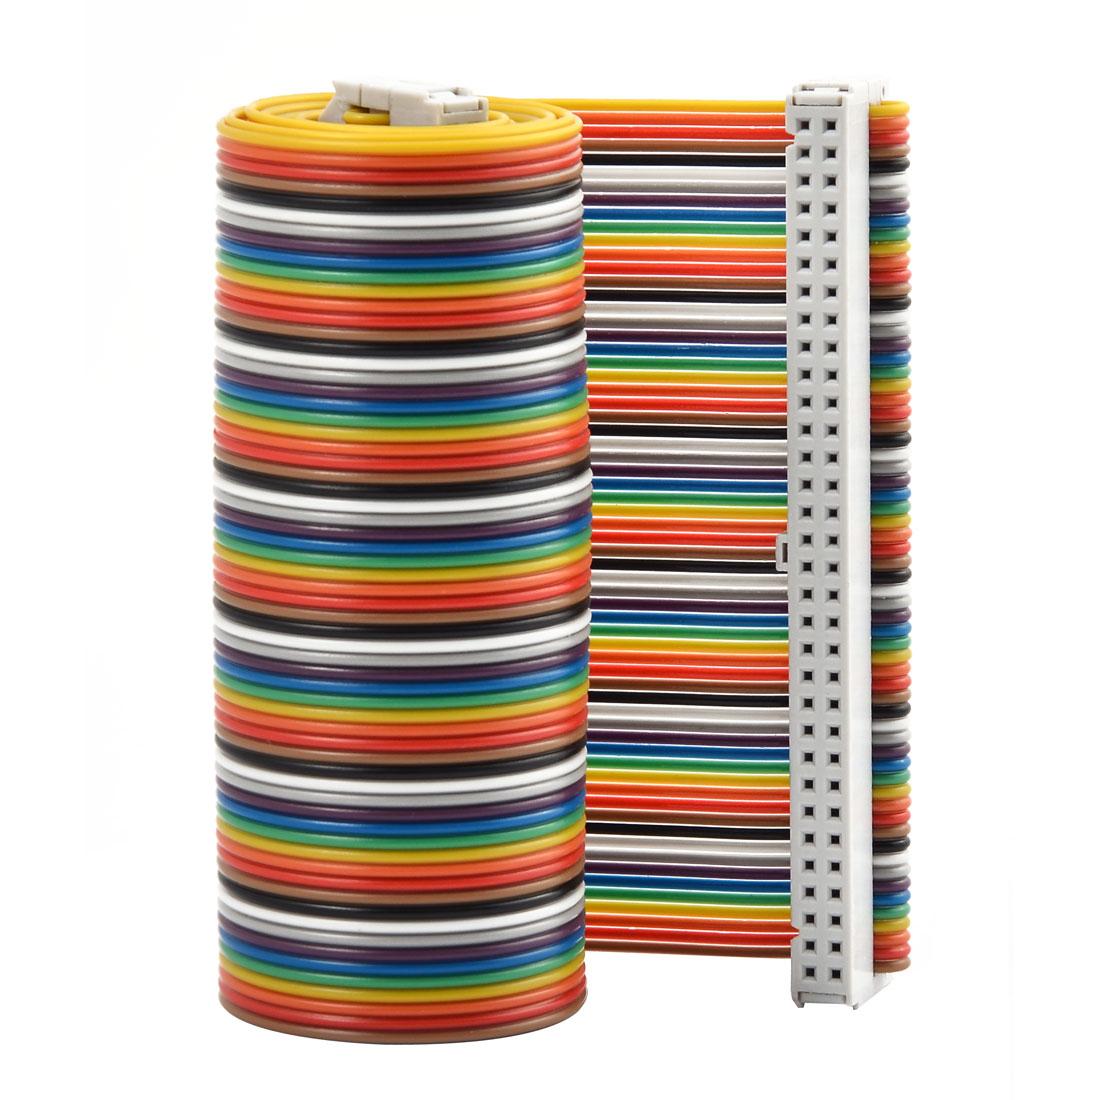 F/F 66cm 64-Pin Flat Jumper Wire Ribbon Cable Strip Connector Multicolor